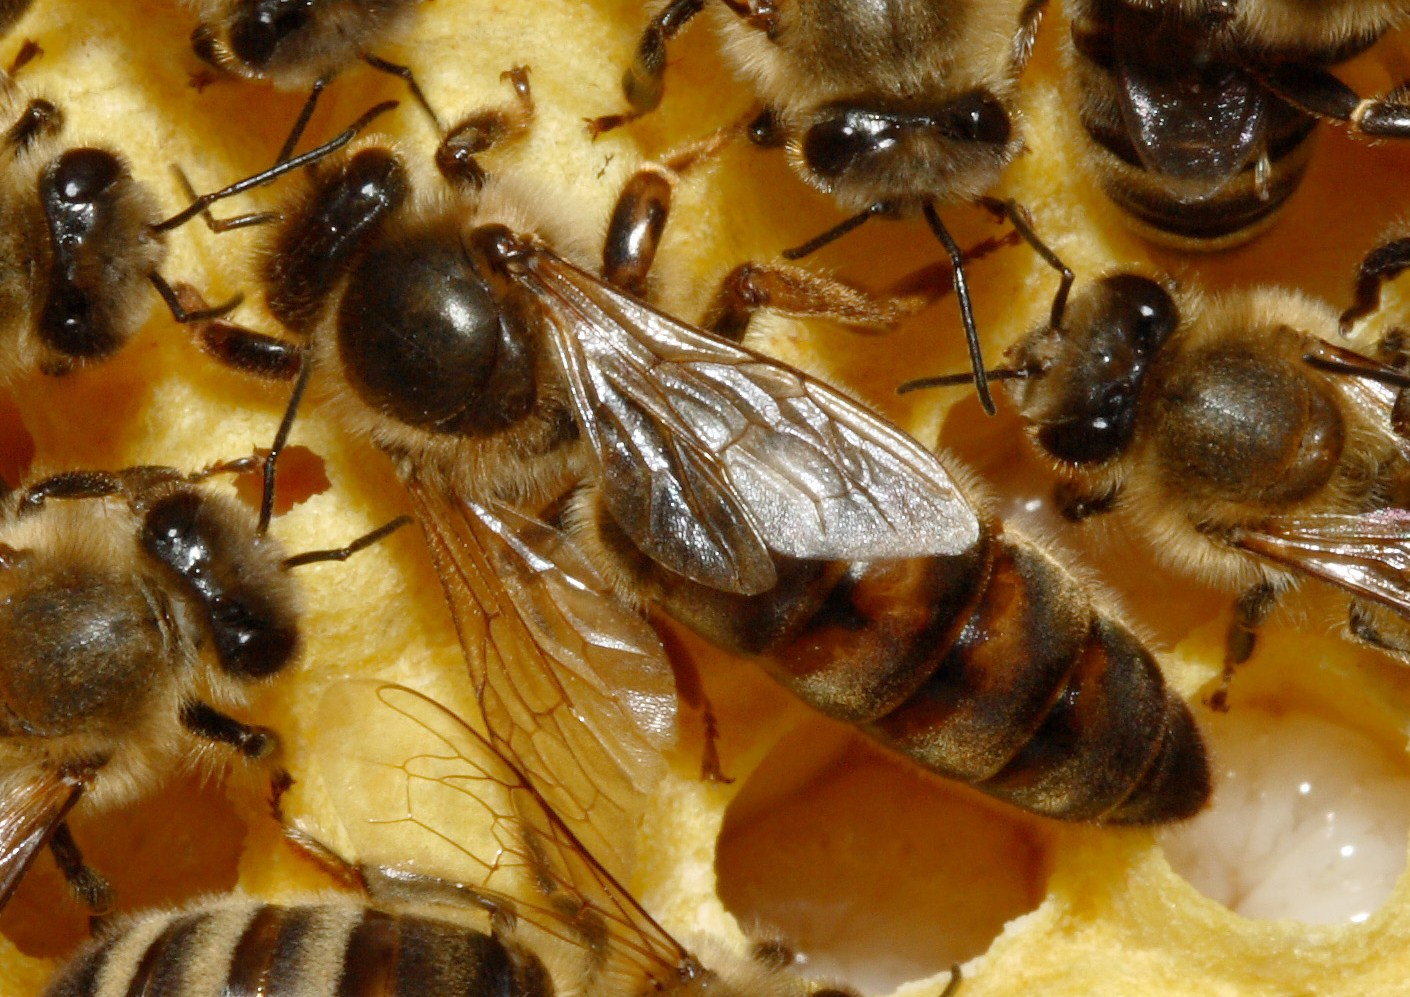 Italian Honey Bee File:Bienenkoenigin 43...